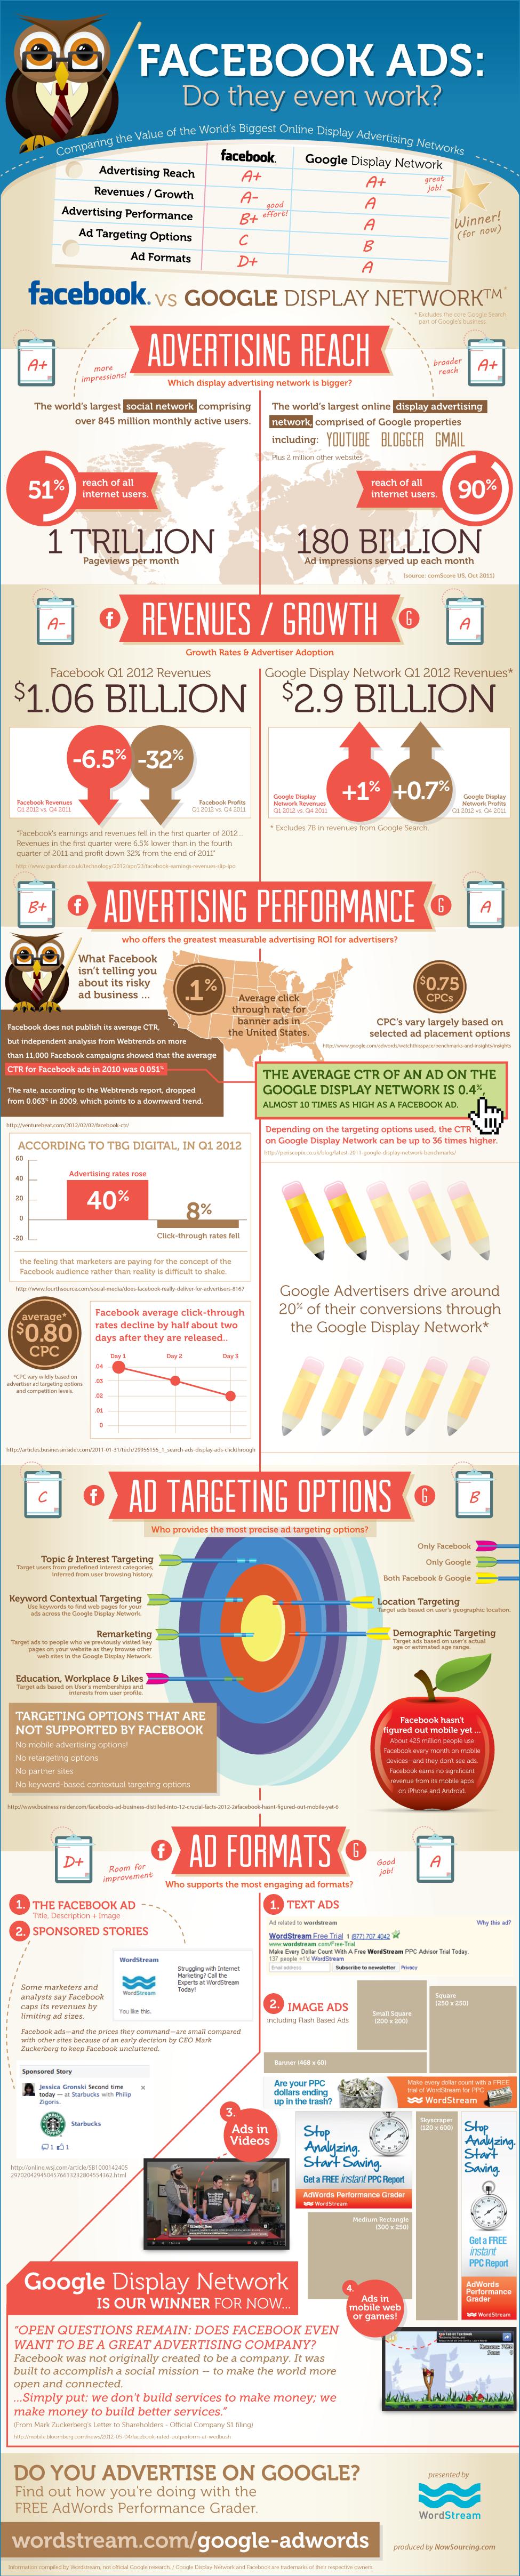 Infographic: Google vs. Facebook advertising